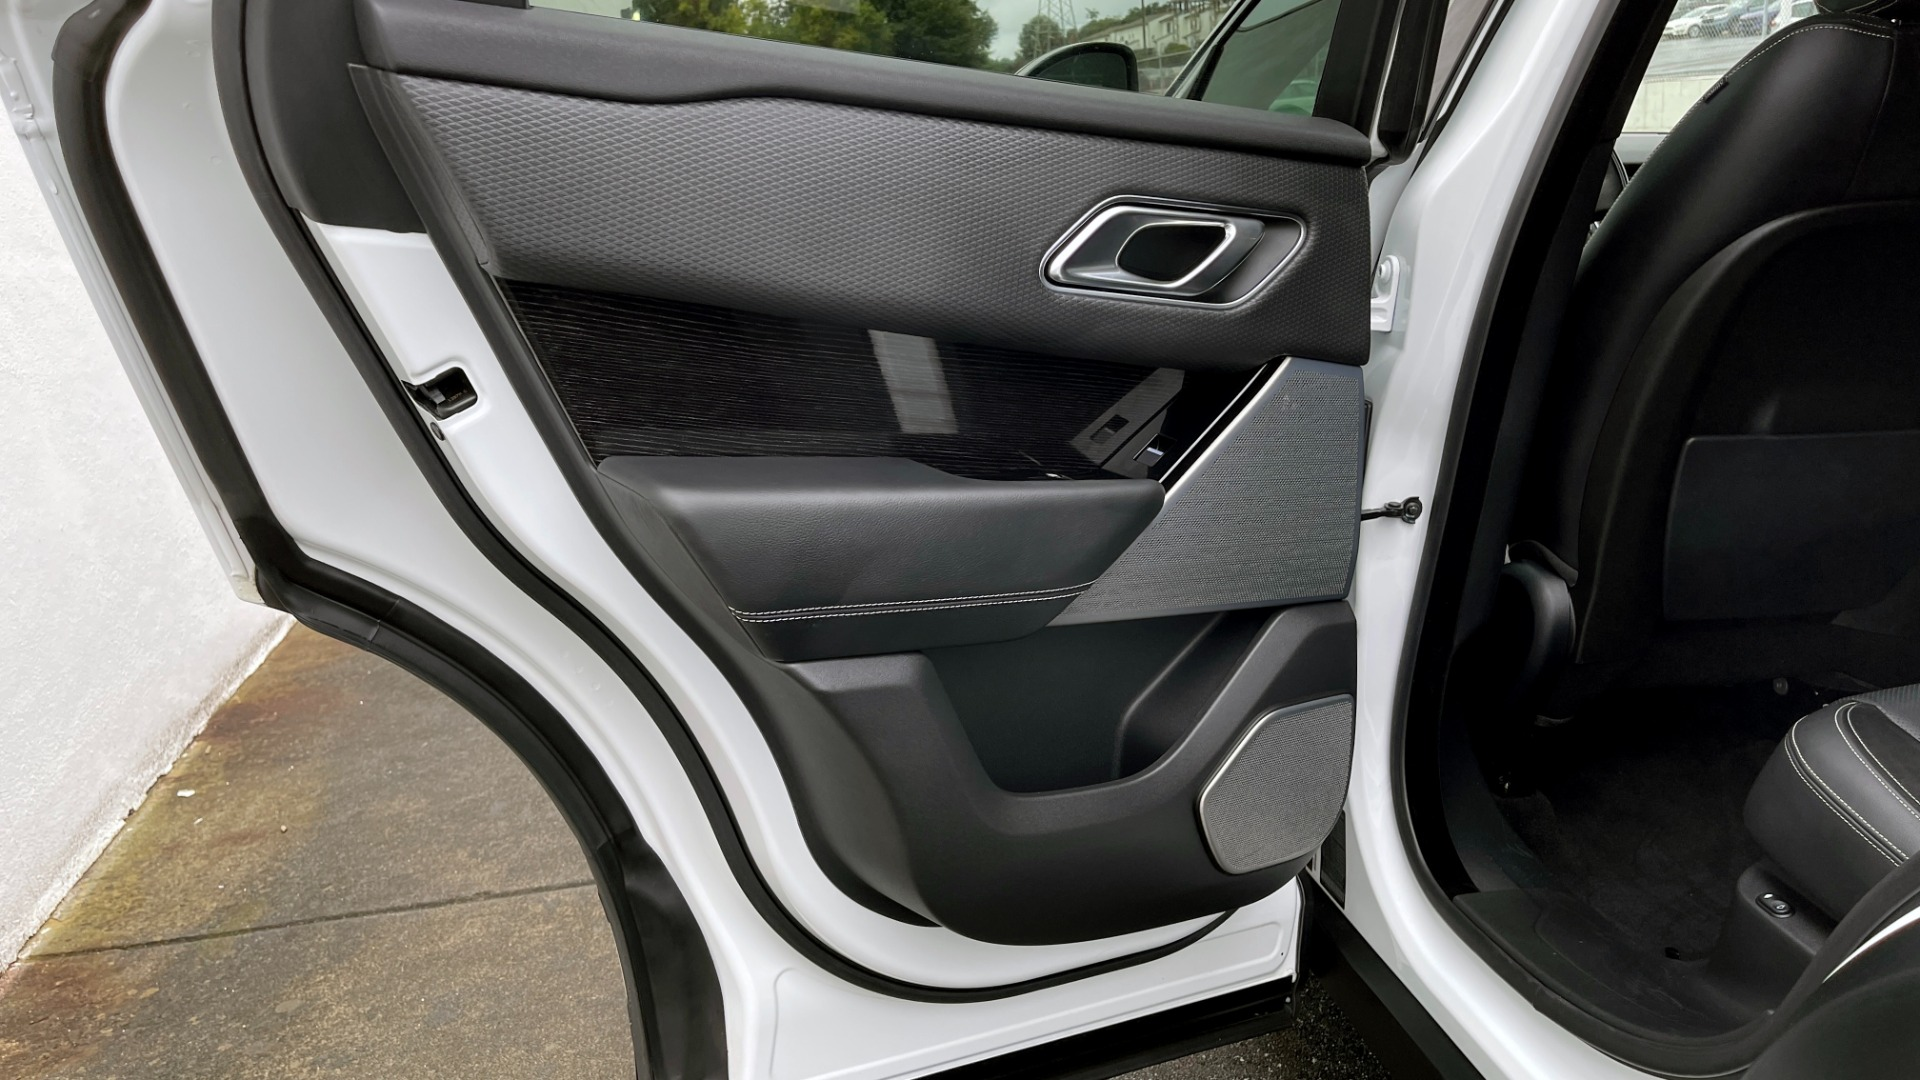 Used 2018 Land Rover RANGE ROVER VELAR R-DYNAMIC SE / NAV / PREM / MERIDIAN / SUNROOF / REARVIEW for sale $54,995 at Formula Imports in Charlotte NC 28227 50